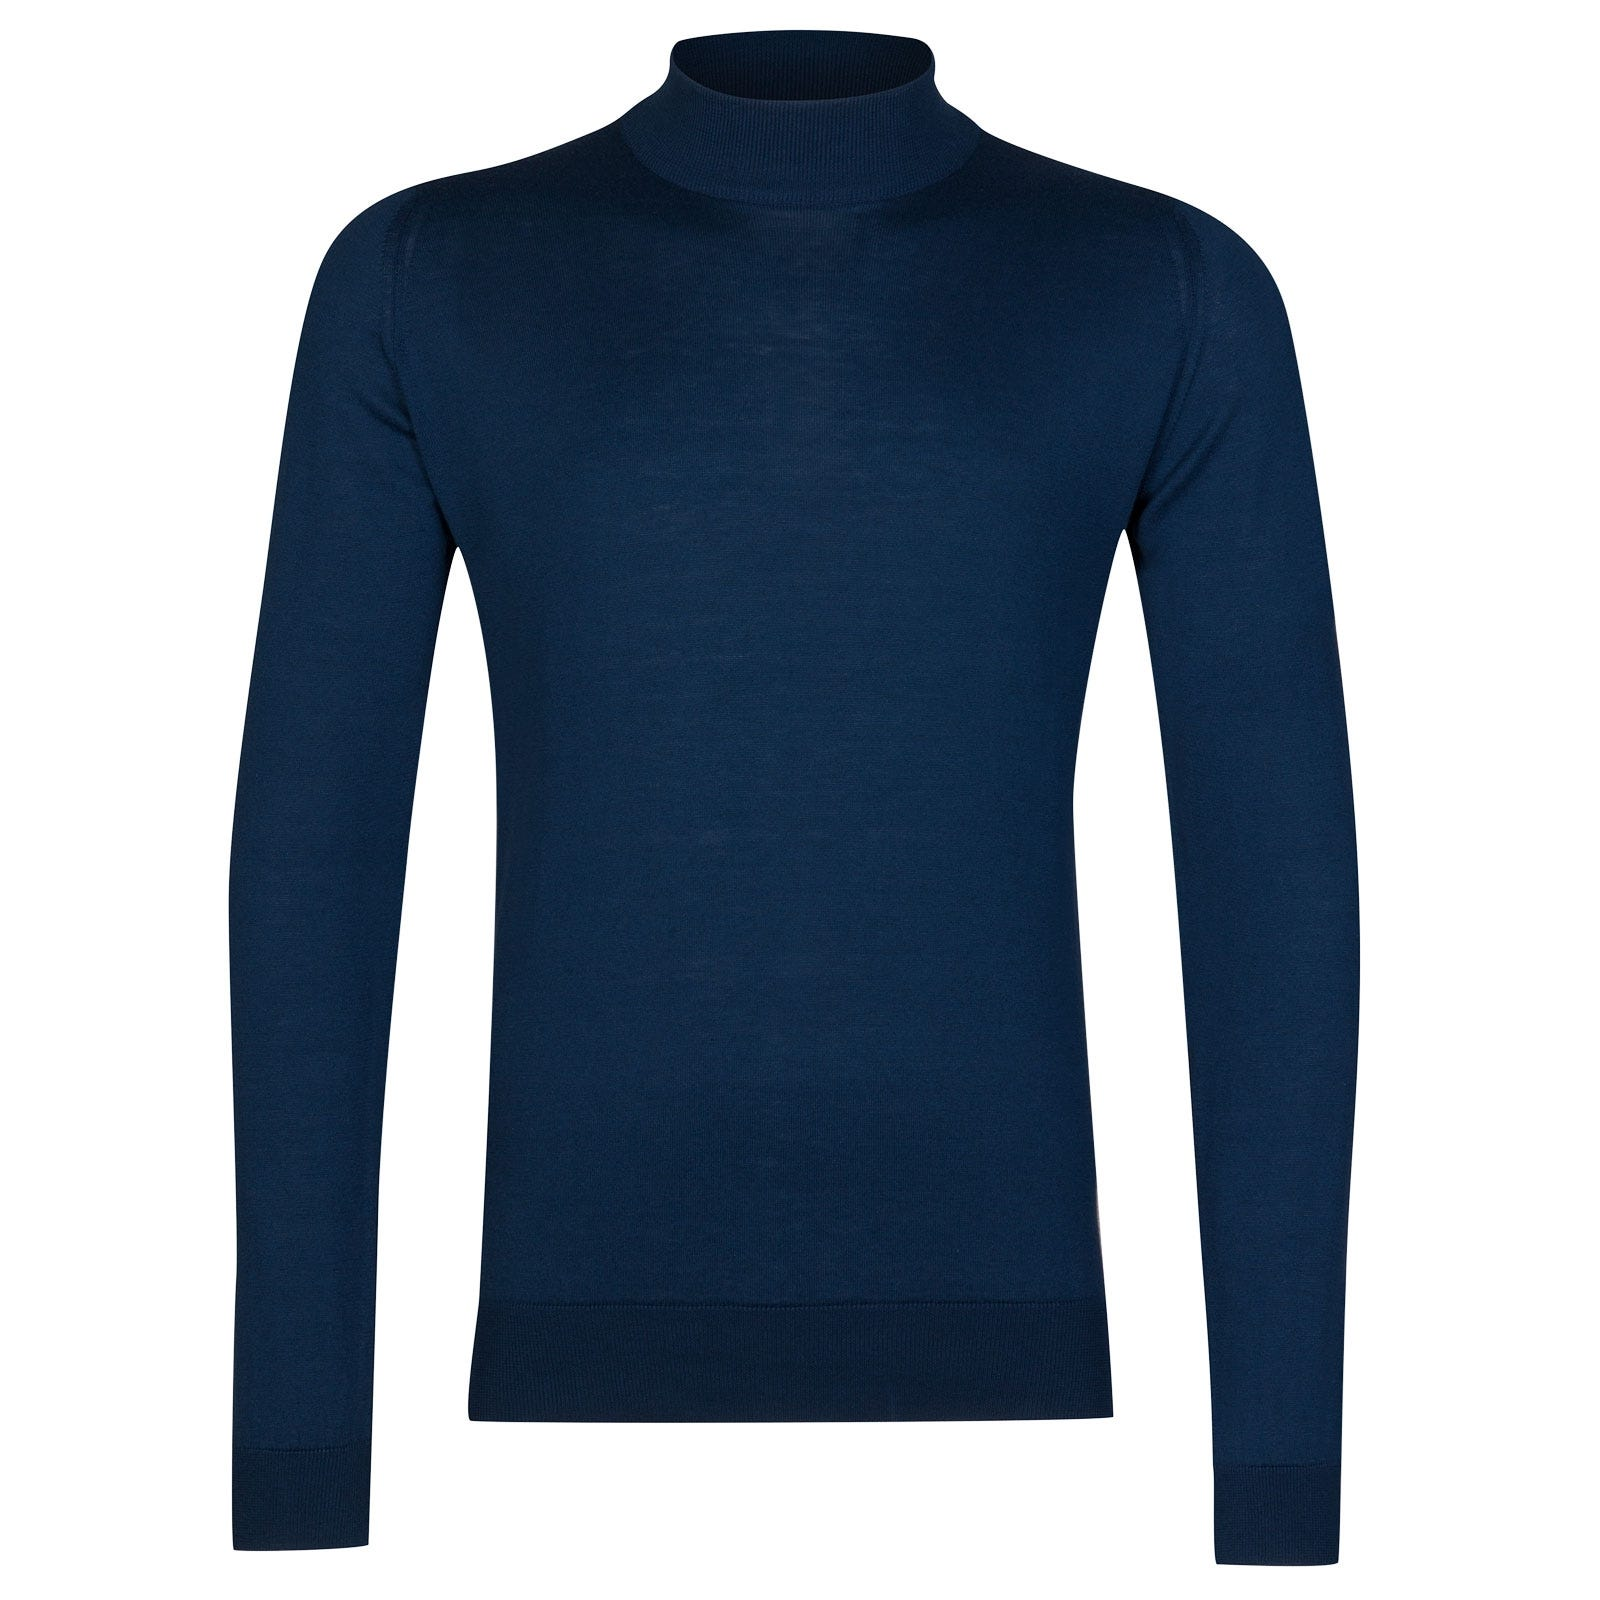 John Smedley Bradgate Sea Island Cotton Pullover in Indigo-L